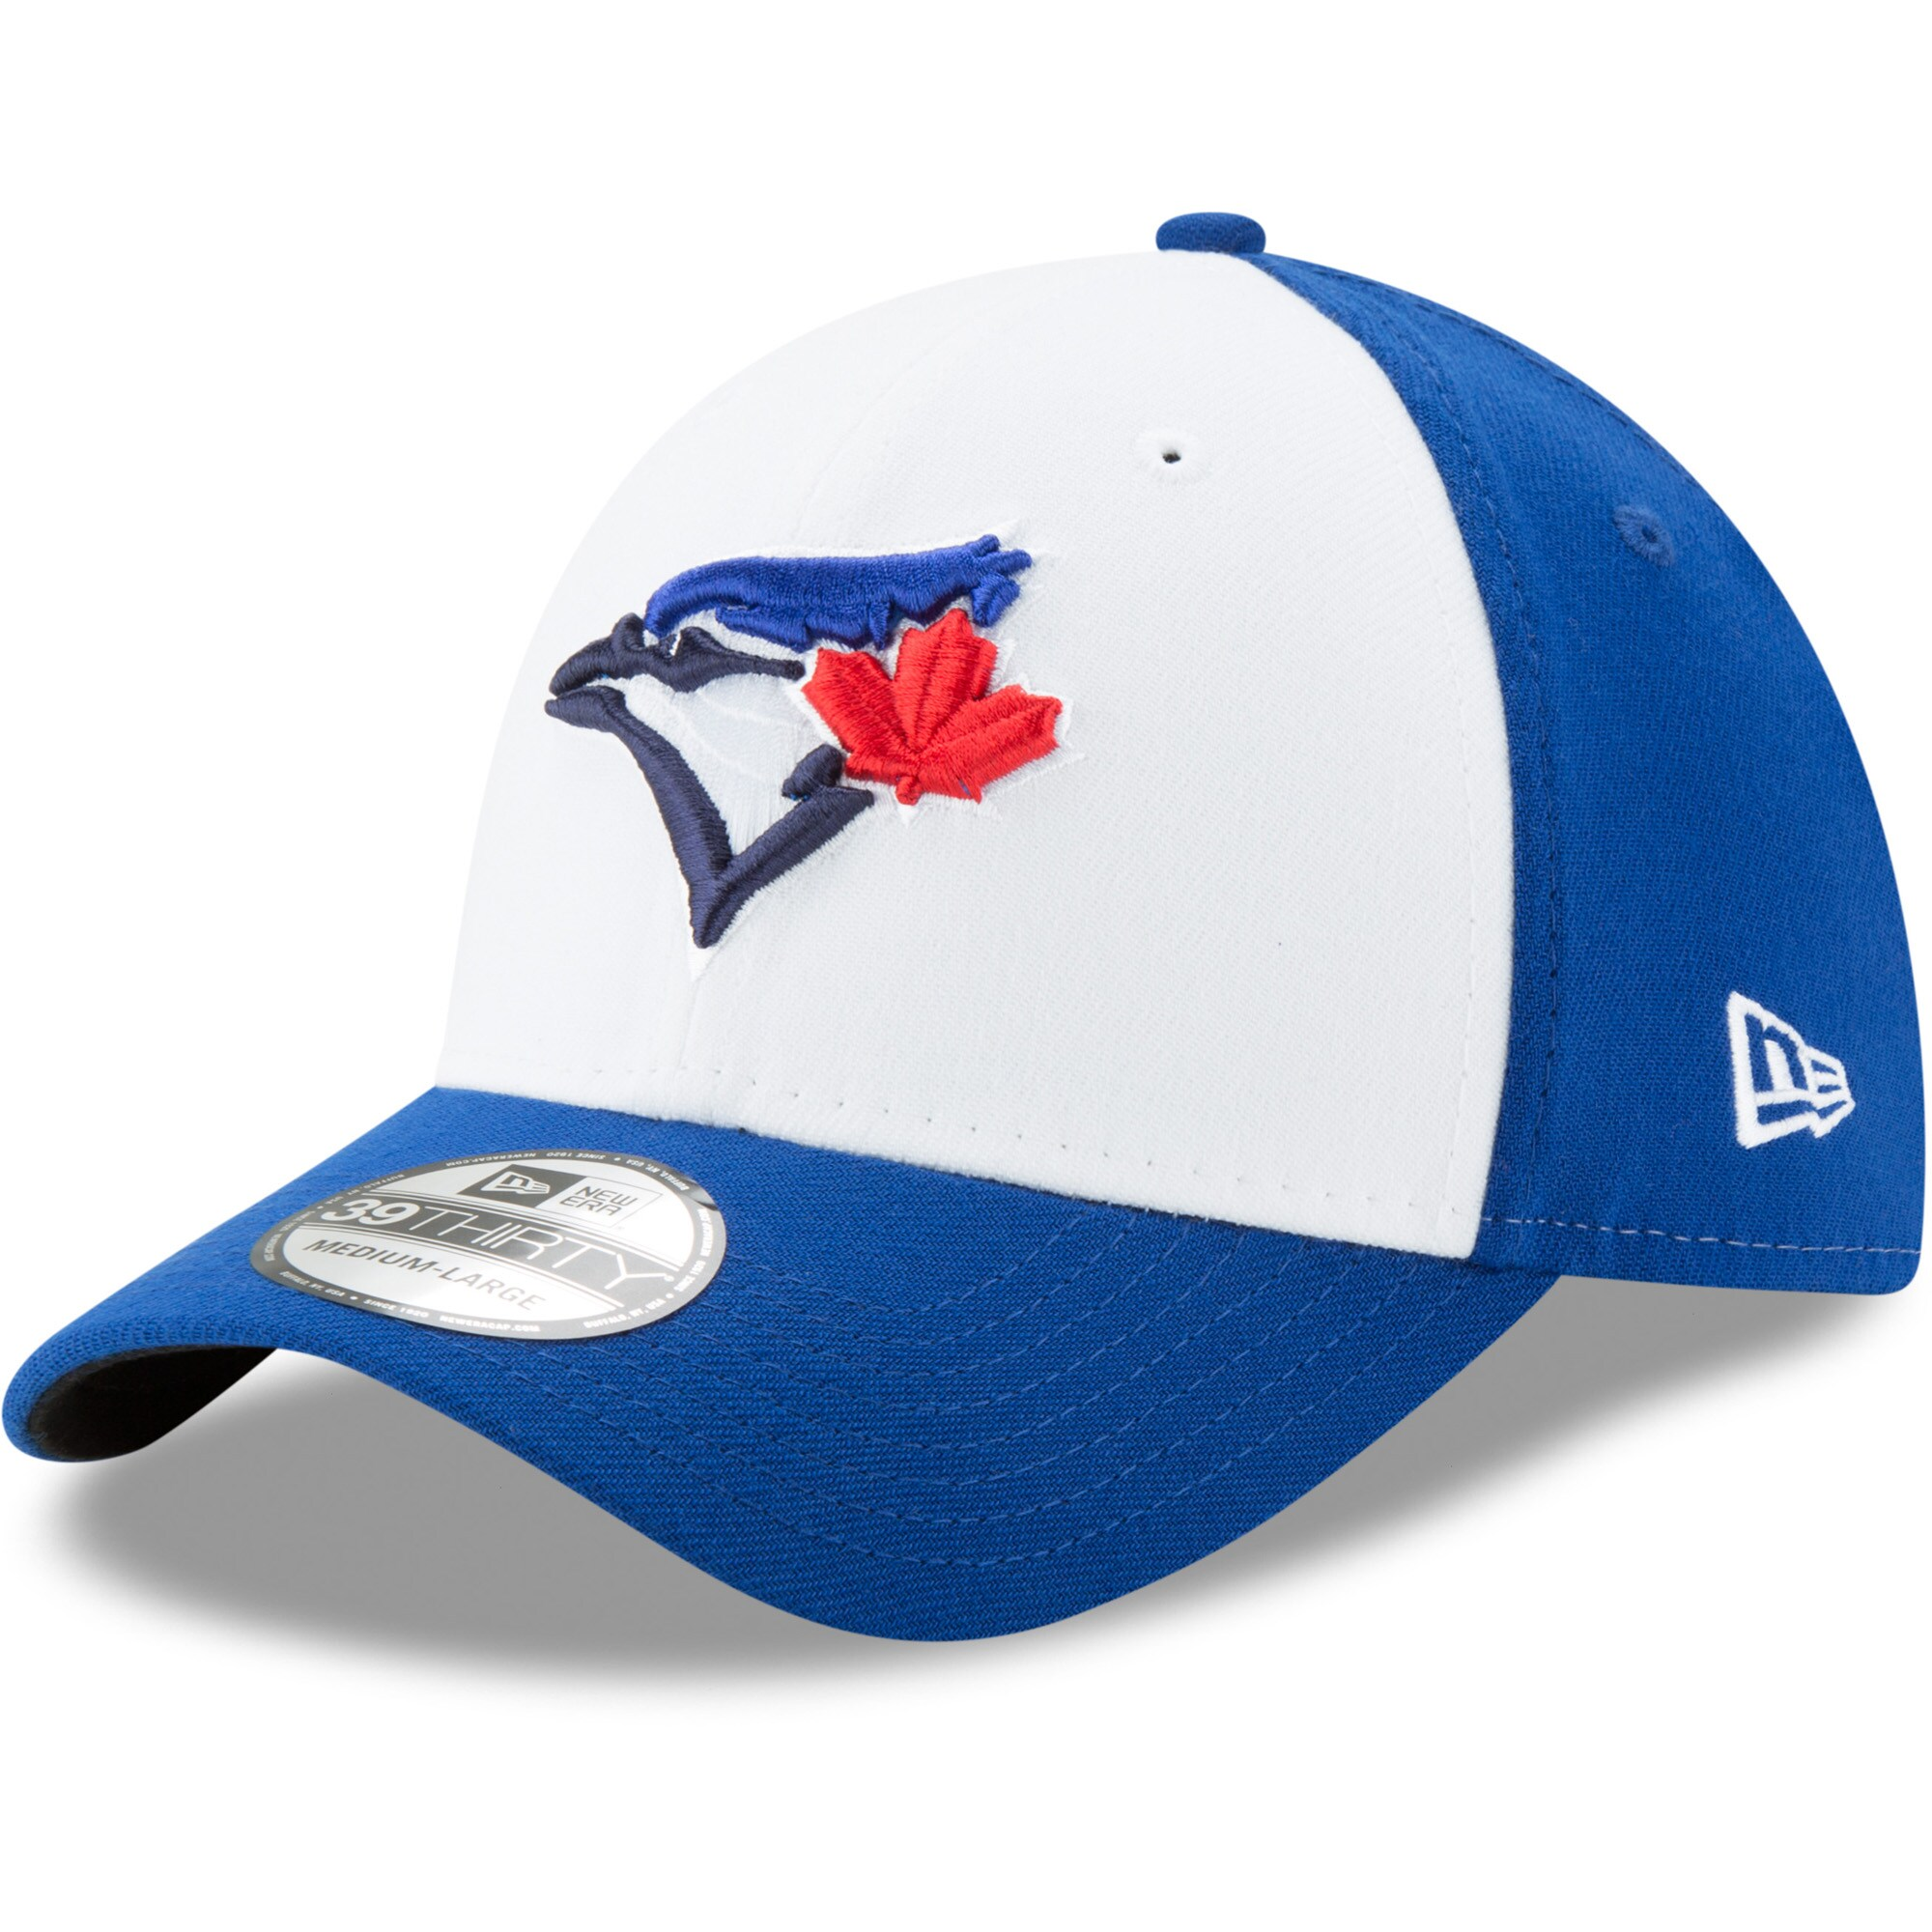 Toronto Blue Jays New Era Alternate 3 Team Classic 39THIRTY Flex Hat - White